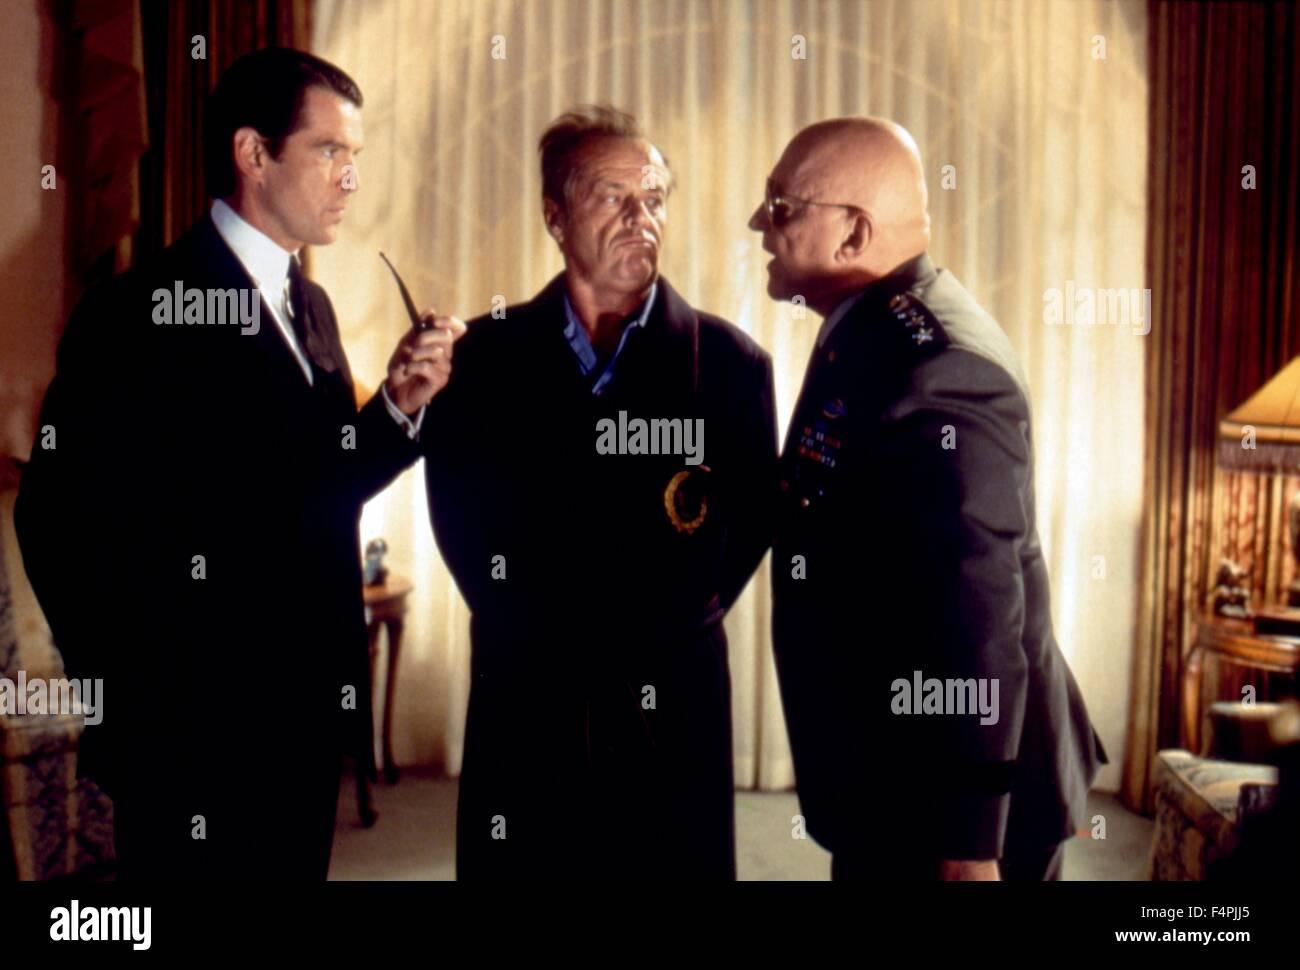 ¿Cuánto mide Jack Nicholson? - Real height - Página 2 Pierce-brosnan-jack-nicholson-y-rod-steiger-mars-attacks-1996-dirigida-por-tim-burton-warner-bros-imagenes-f4pjj5